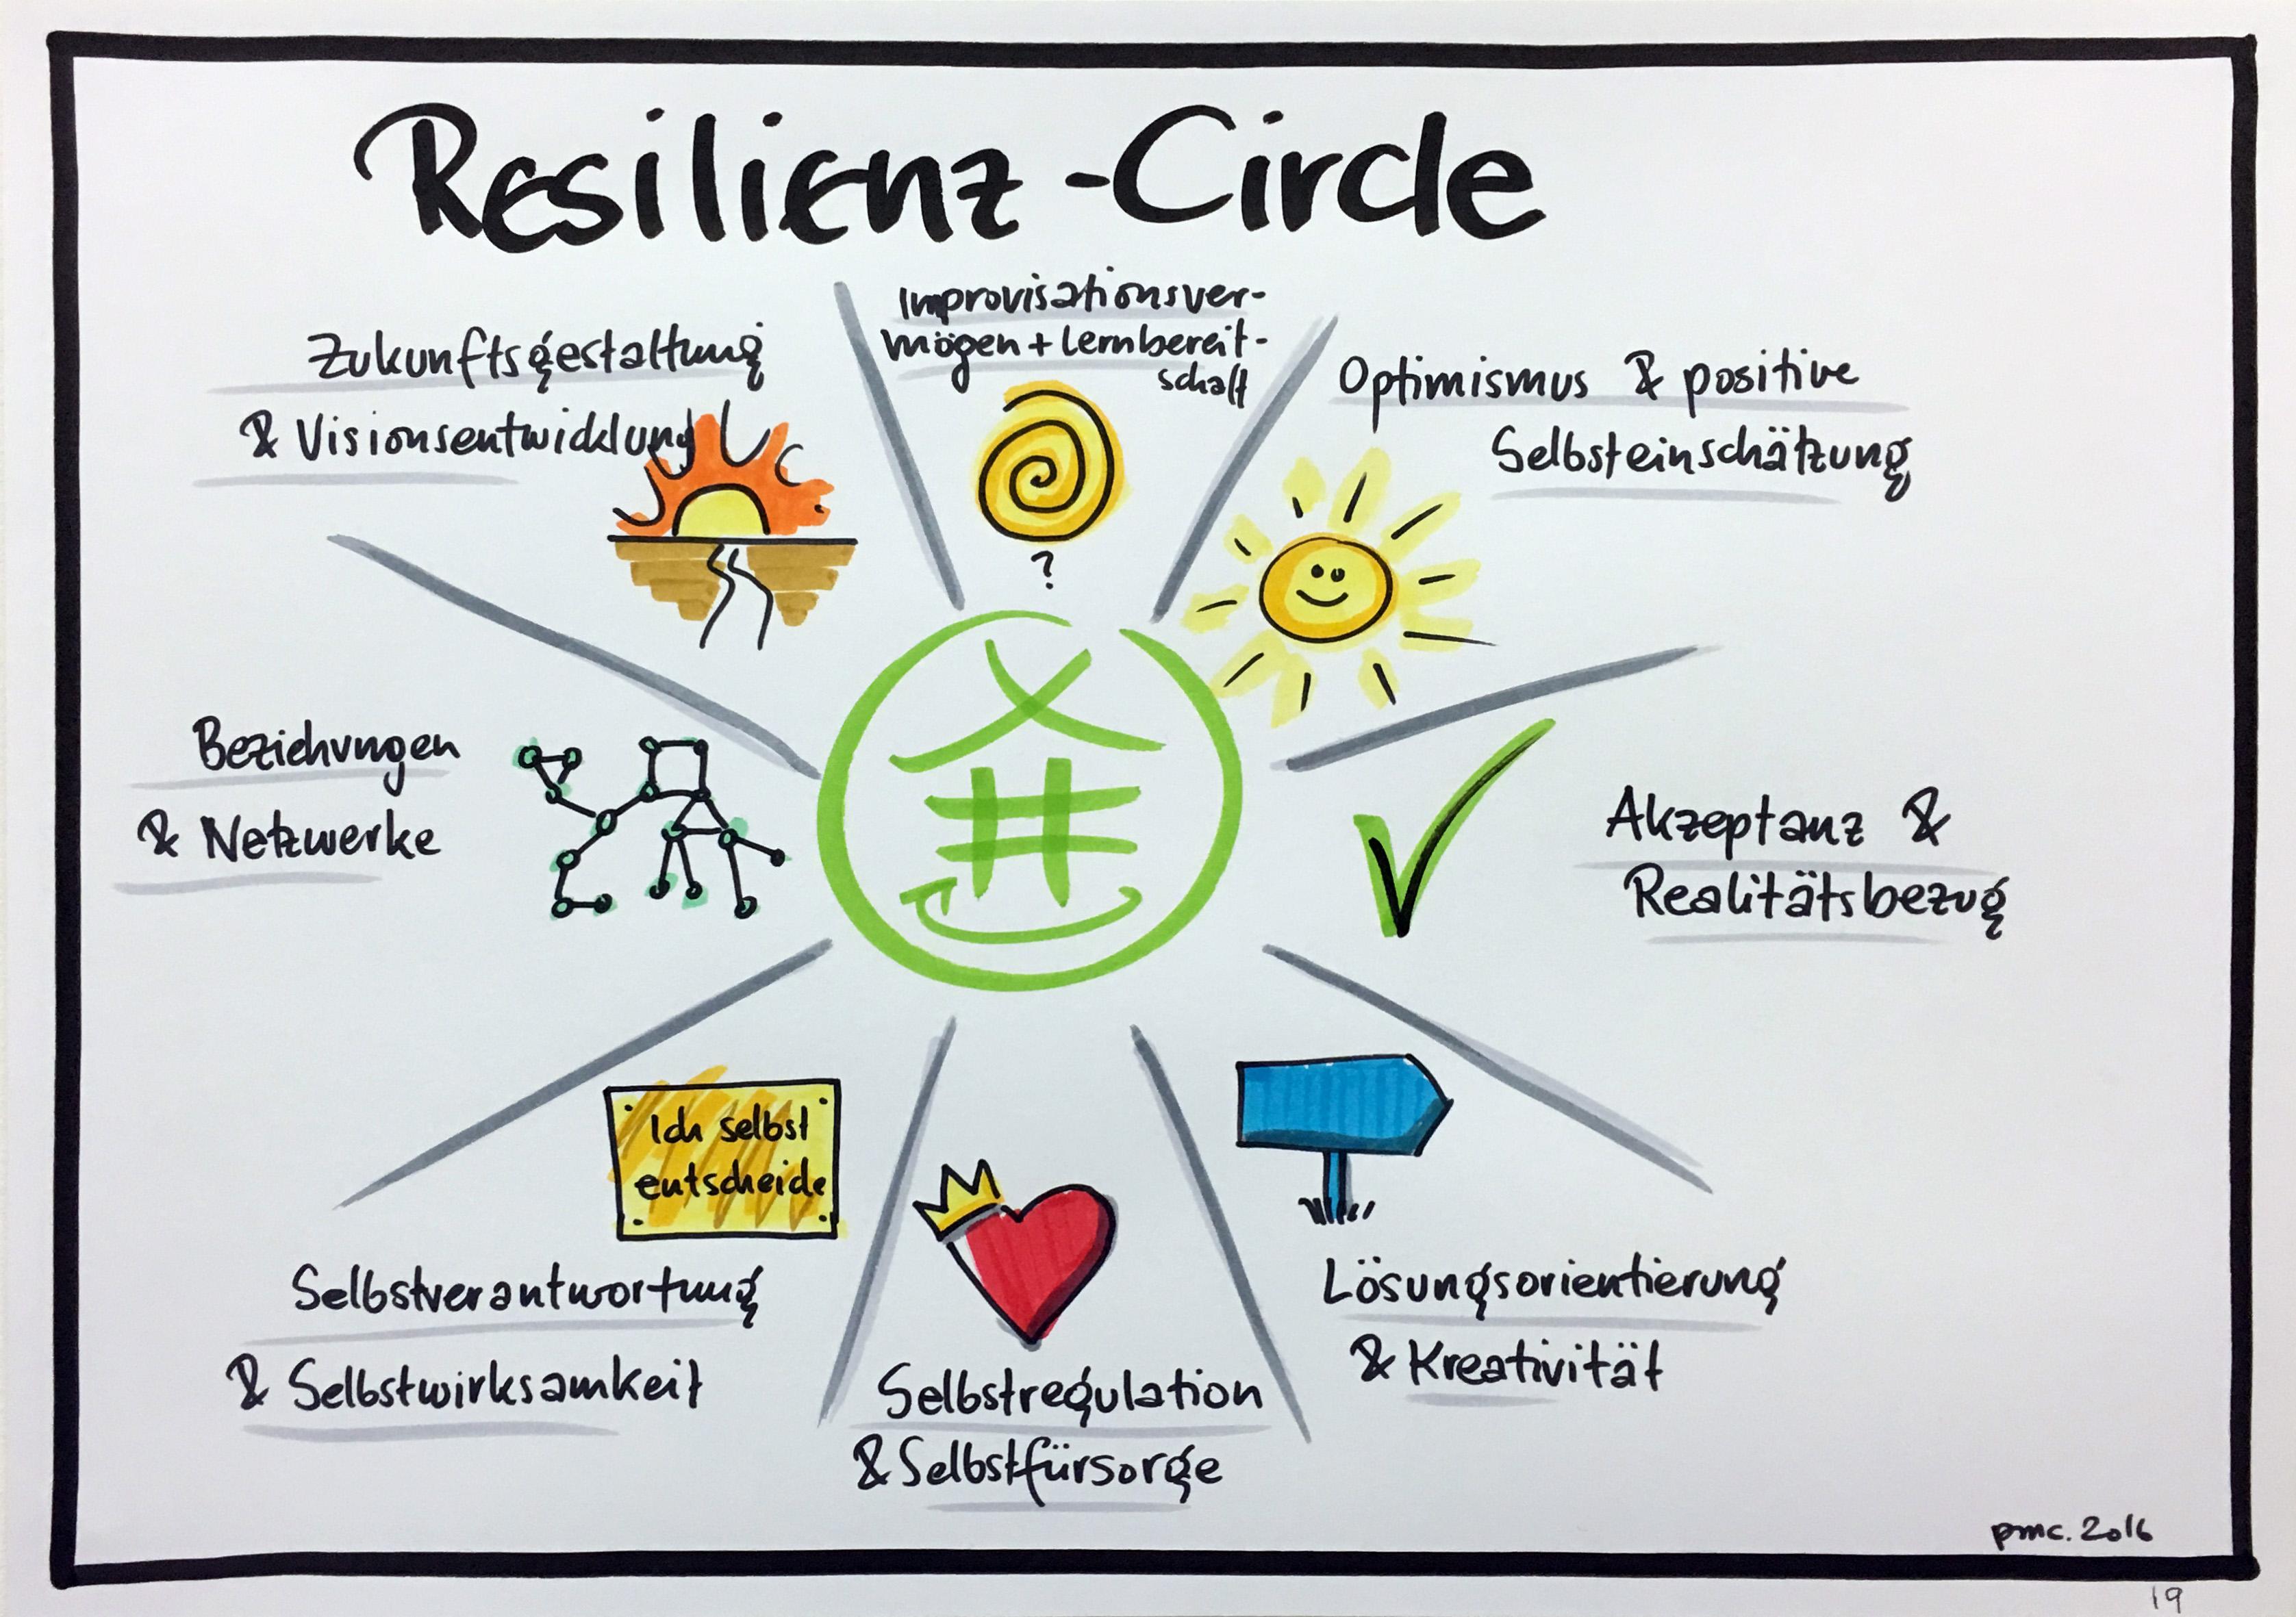 Resilienz-Zirkel-Training